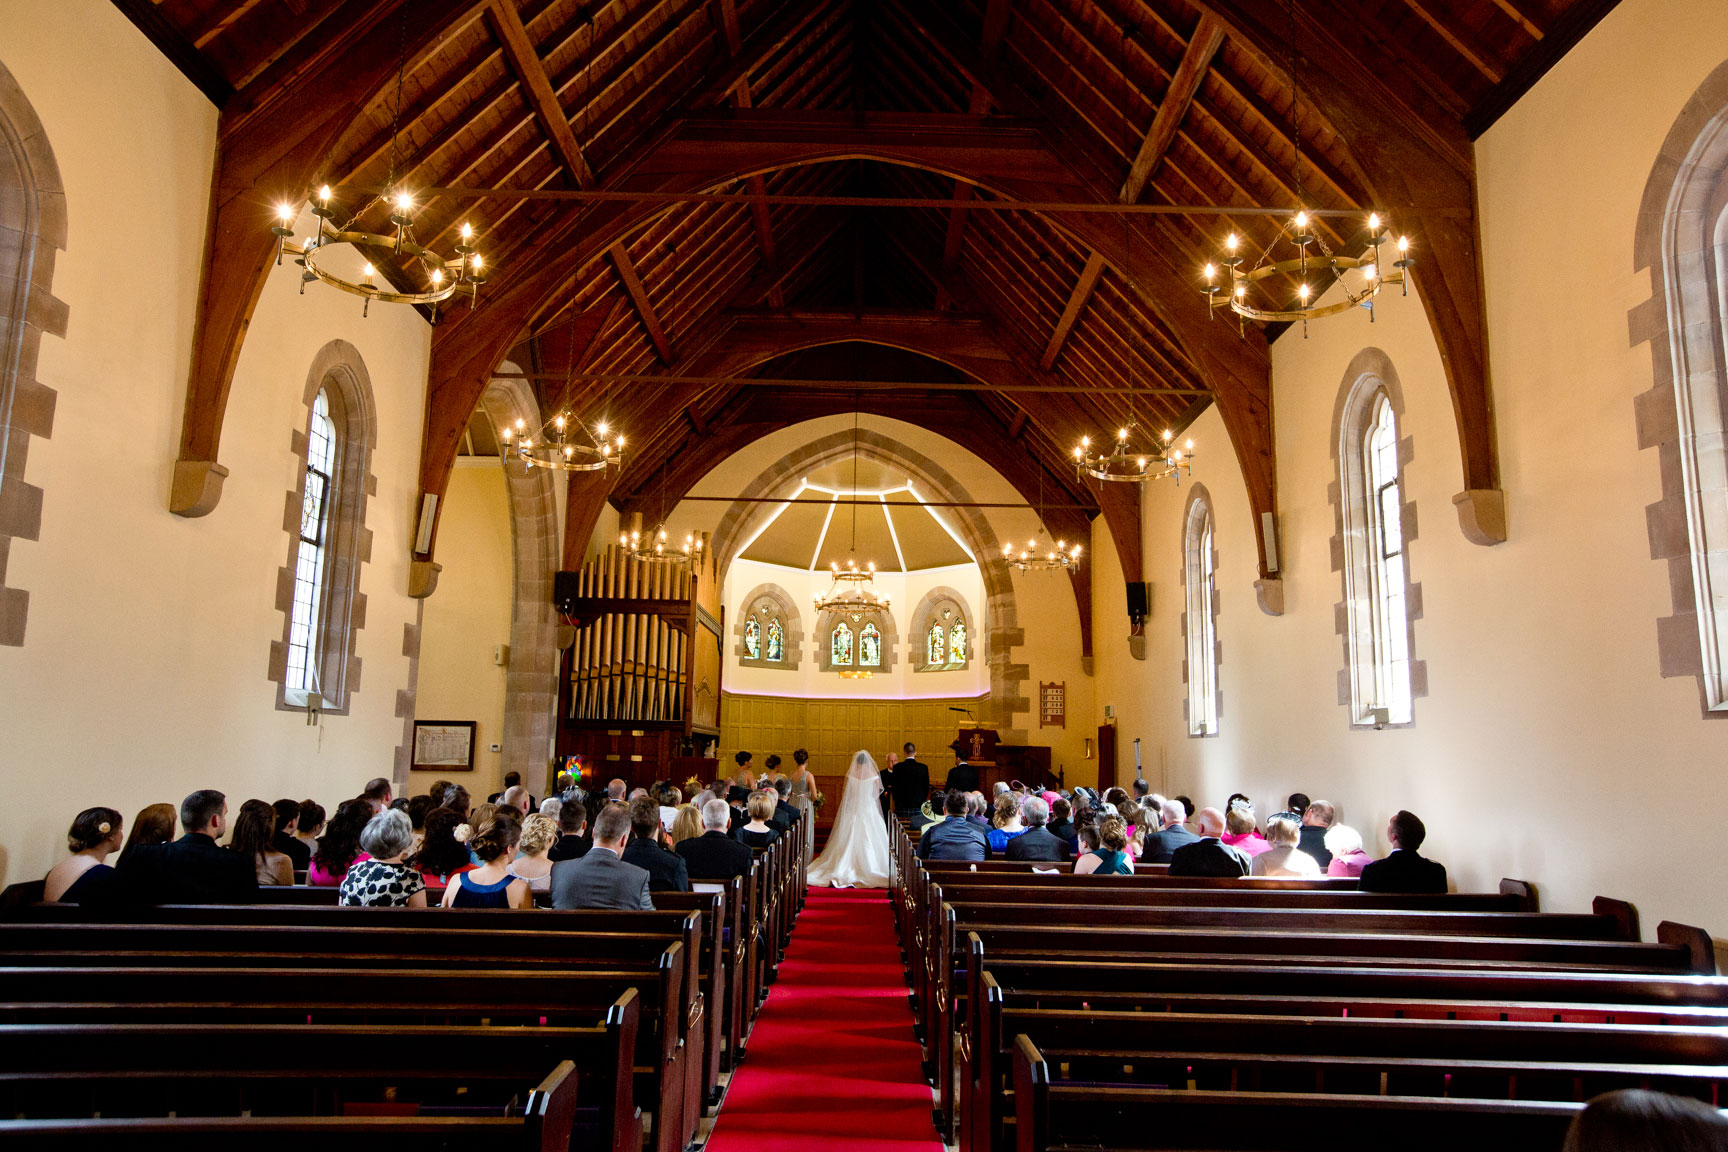 st-stephens-church-of-scotland-inverness